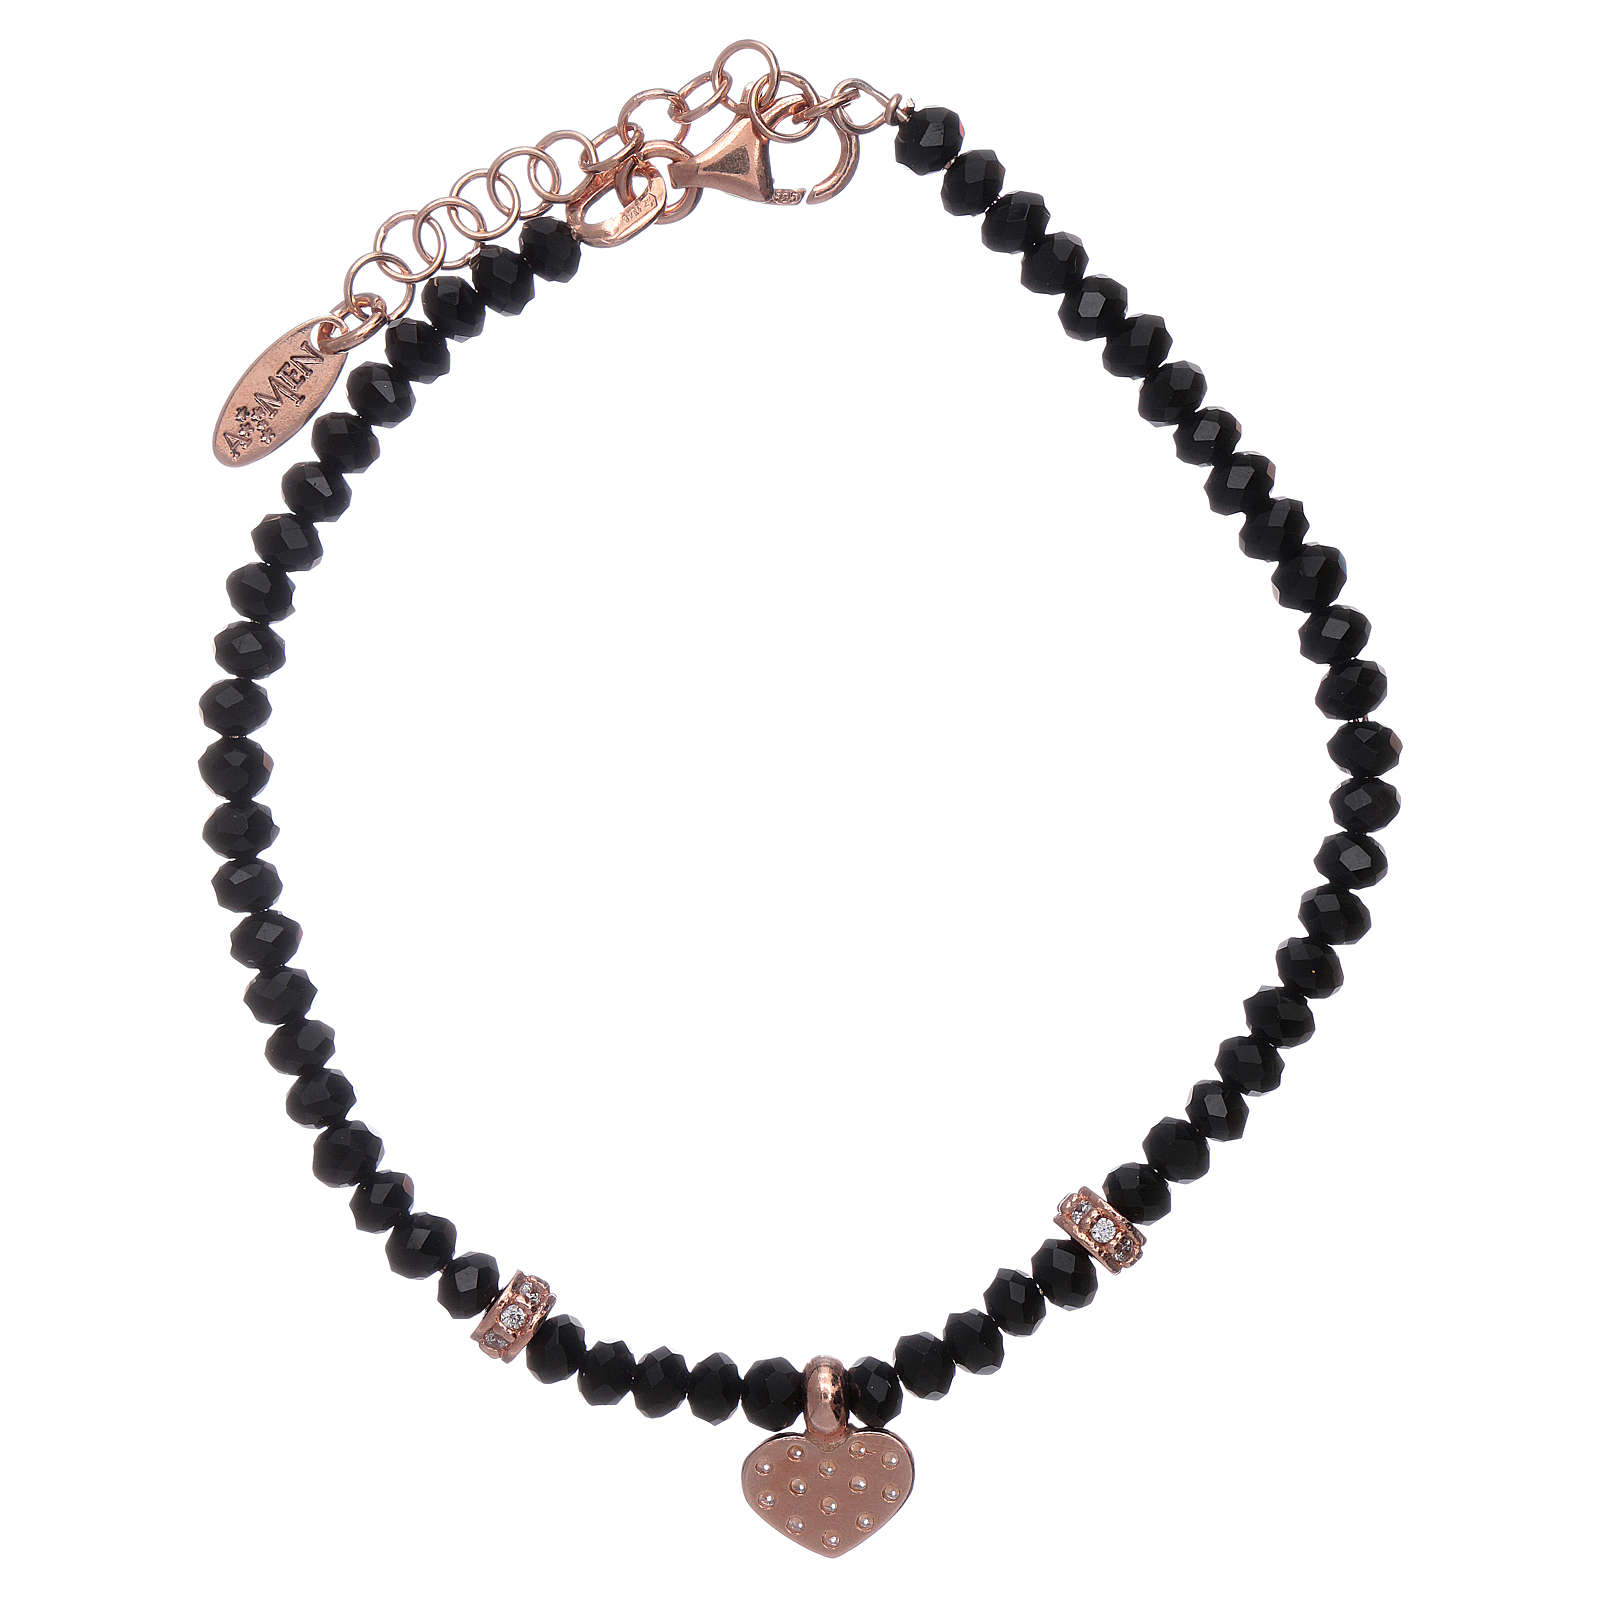 Bracciale Amen cristalli neri cuore argento 925 rosé e zirconi 4